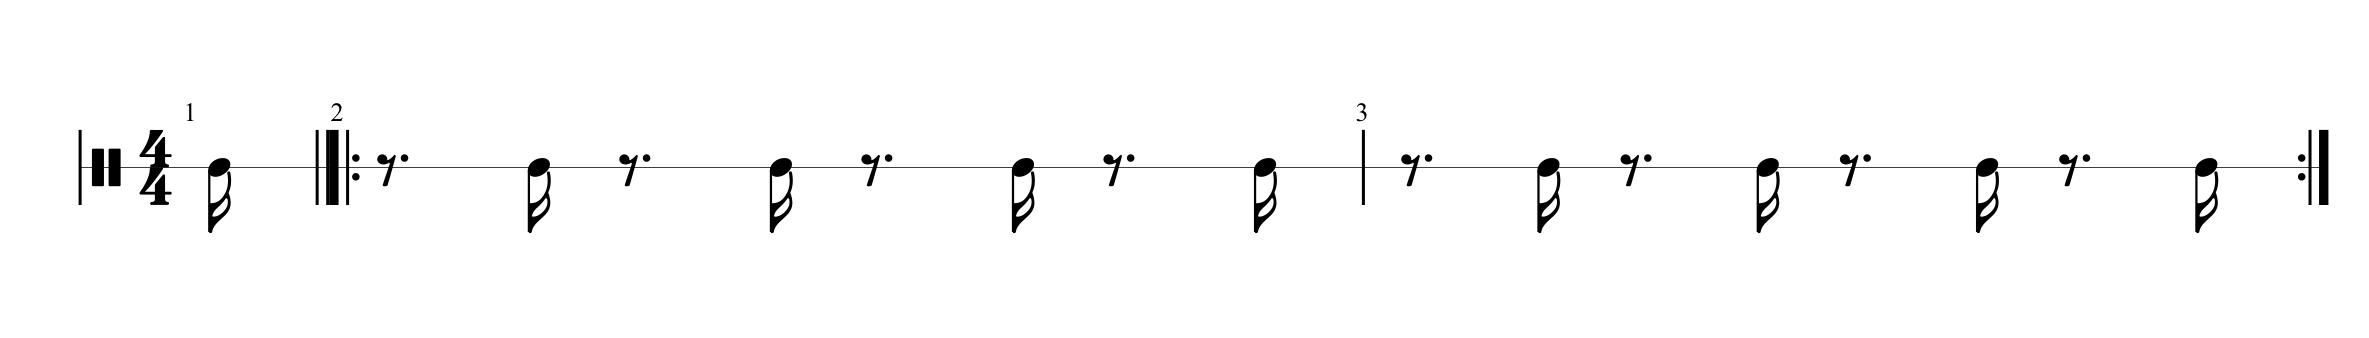 Metronome Displacement